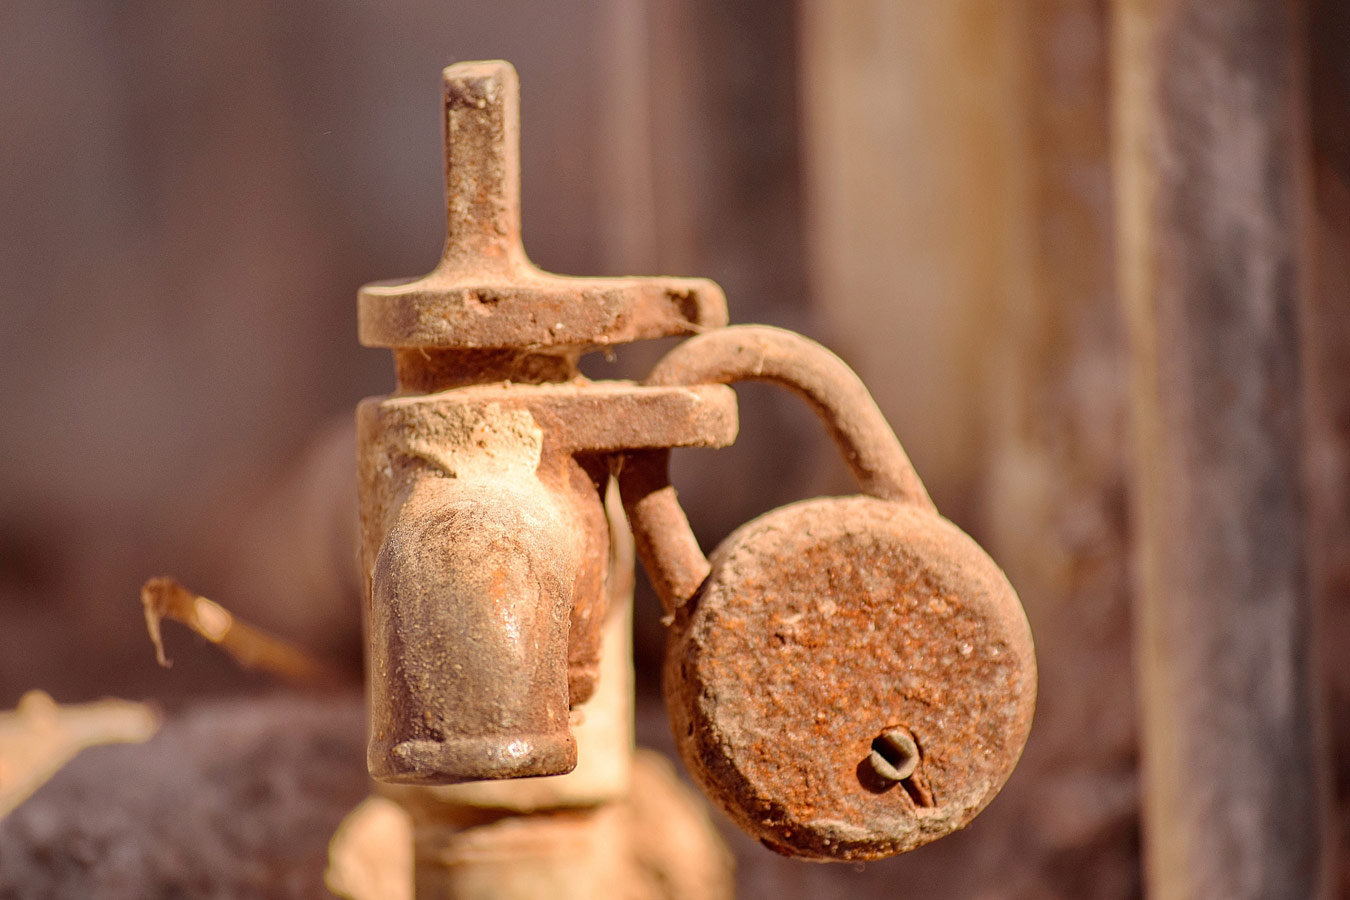 © Sagar j. Gondaliya, Gender and Water Integrity Photo Competition